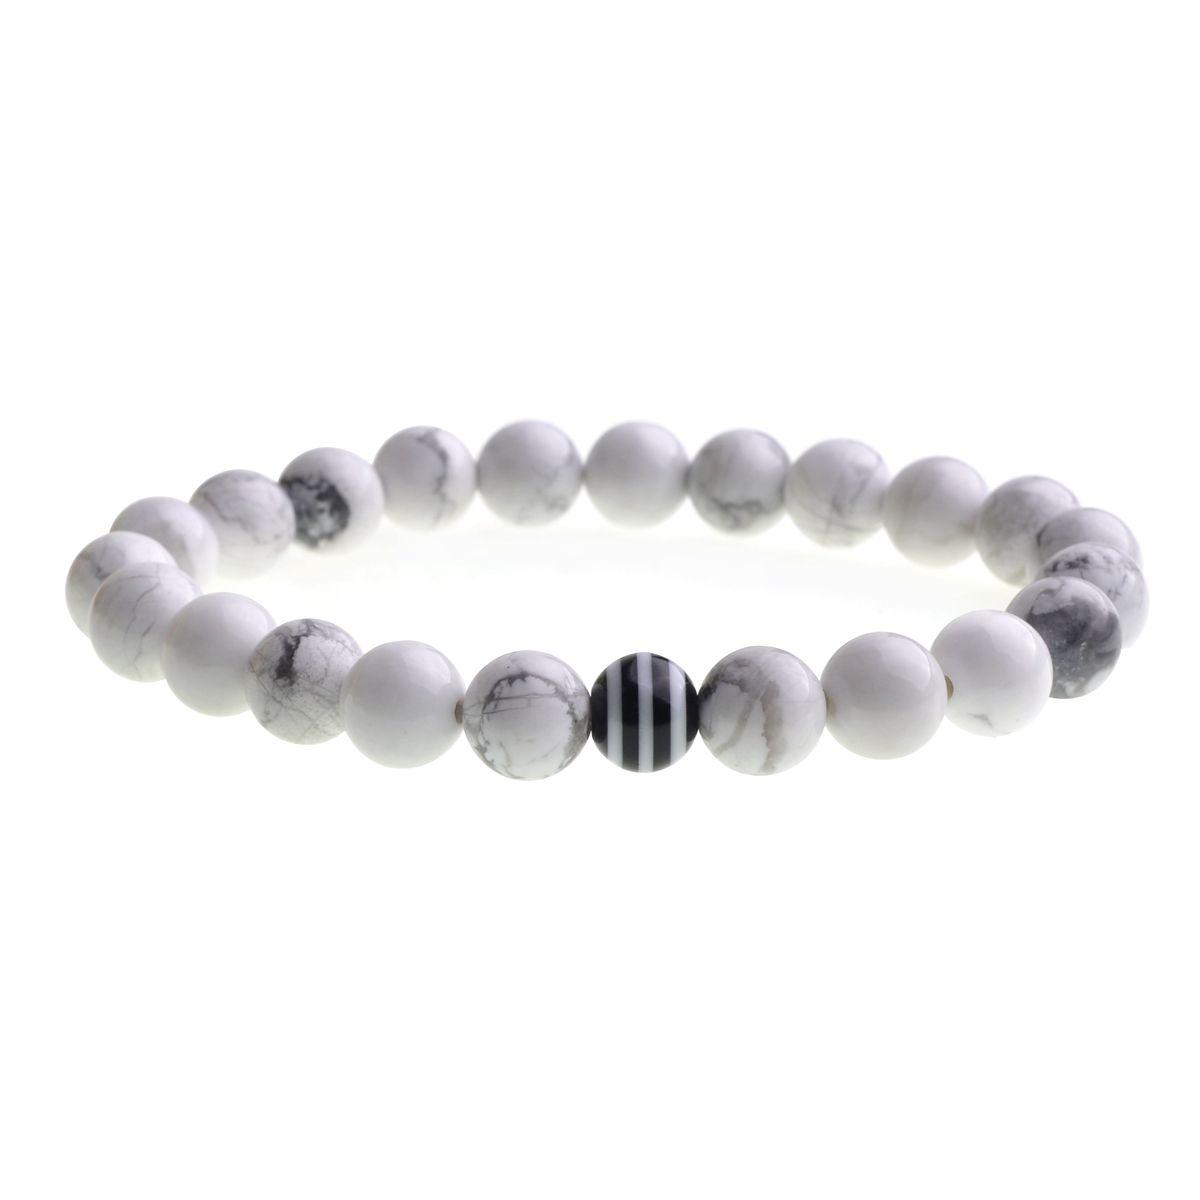 d95dc7639d6d1 1 resin stripe bracelet with meaningful London distance bracelet | strong  elasticity | friendship relationship men and women Valentine s Day